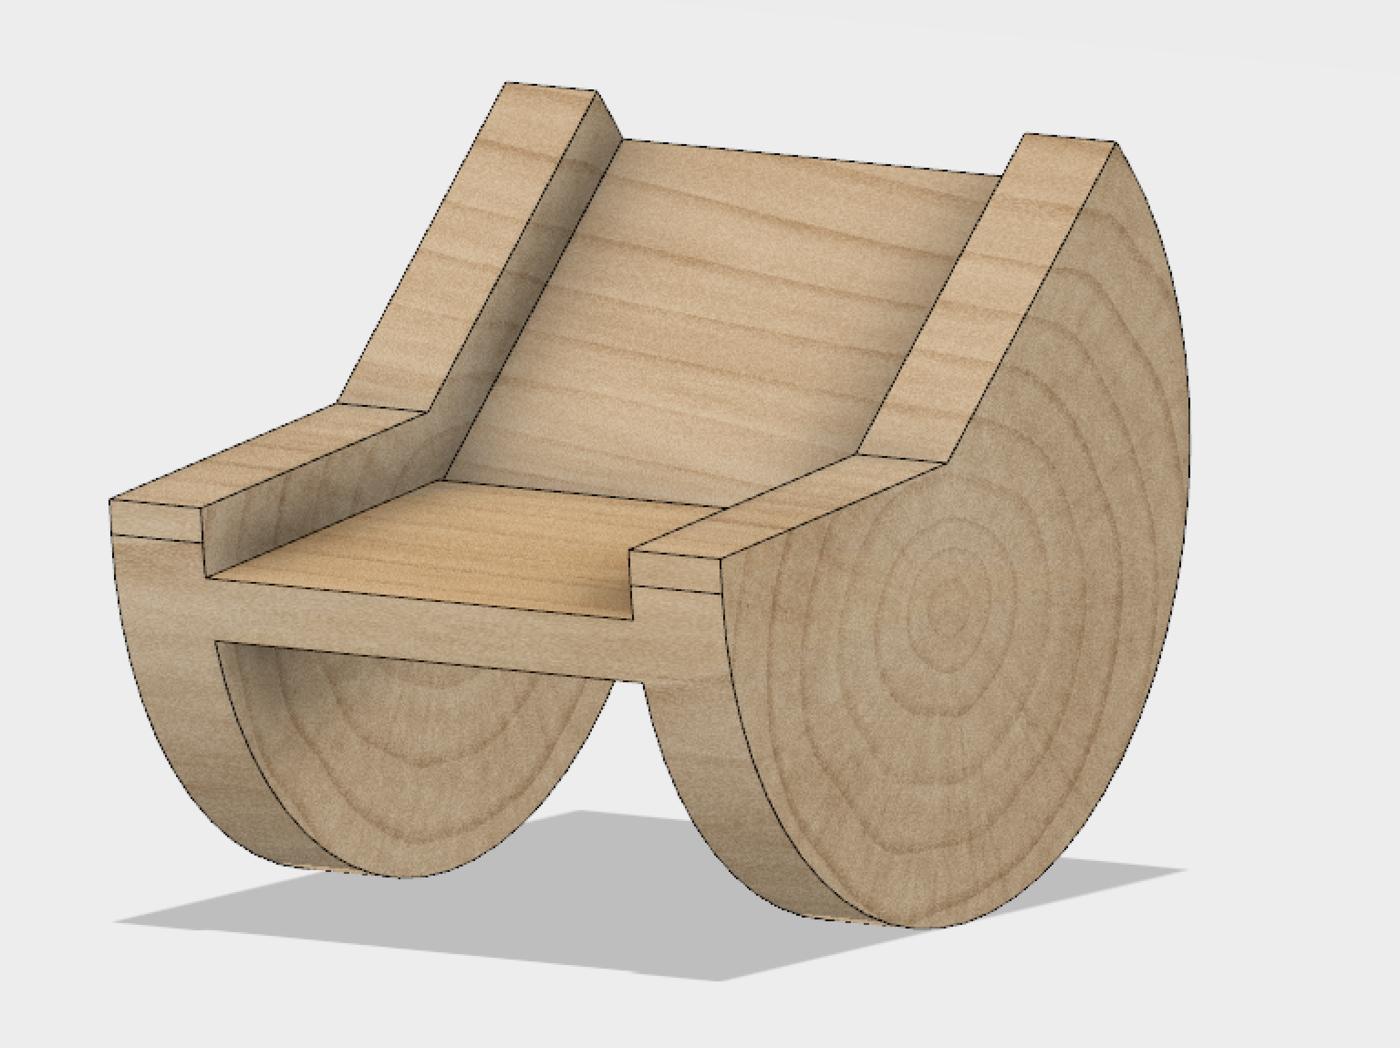 Incredible Circular Wedge Rocker Chair By Jordan Linton At Coroflot Com Customarchery Wood Chair Design Ideas Customarcherynet